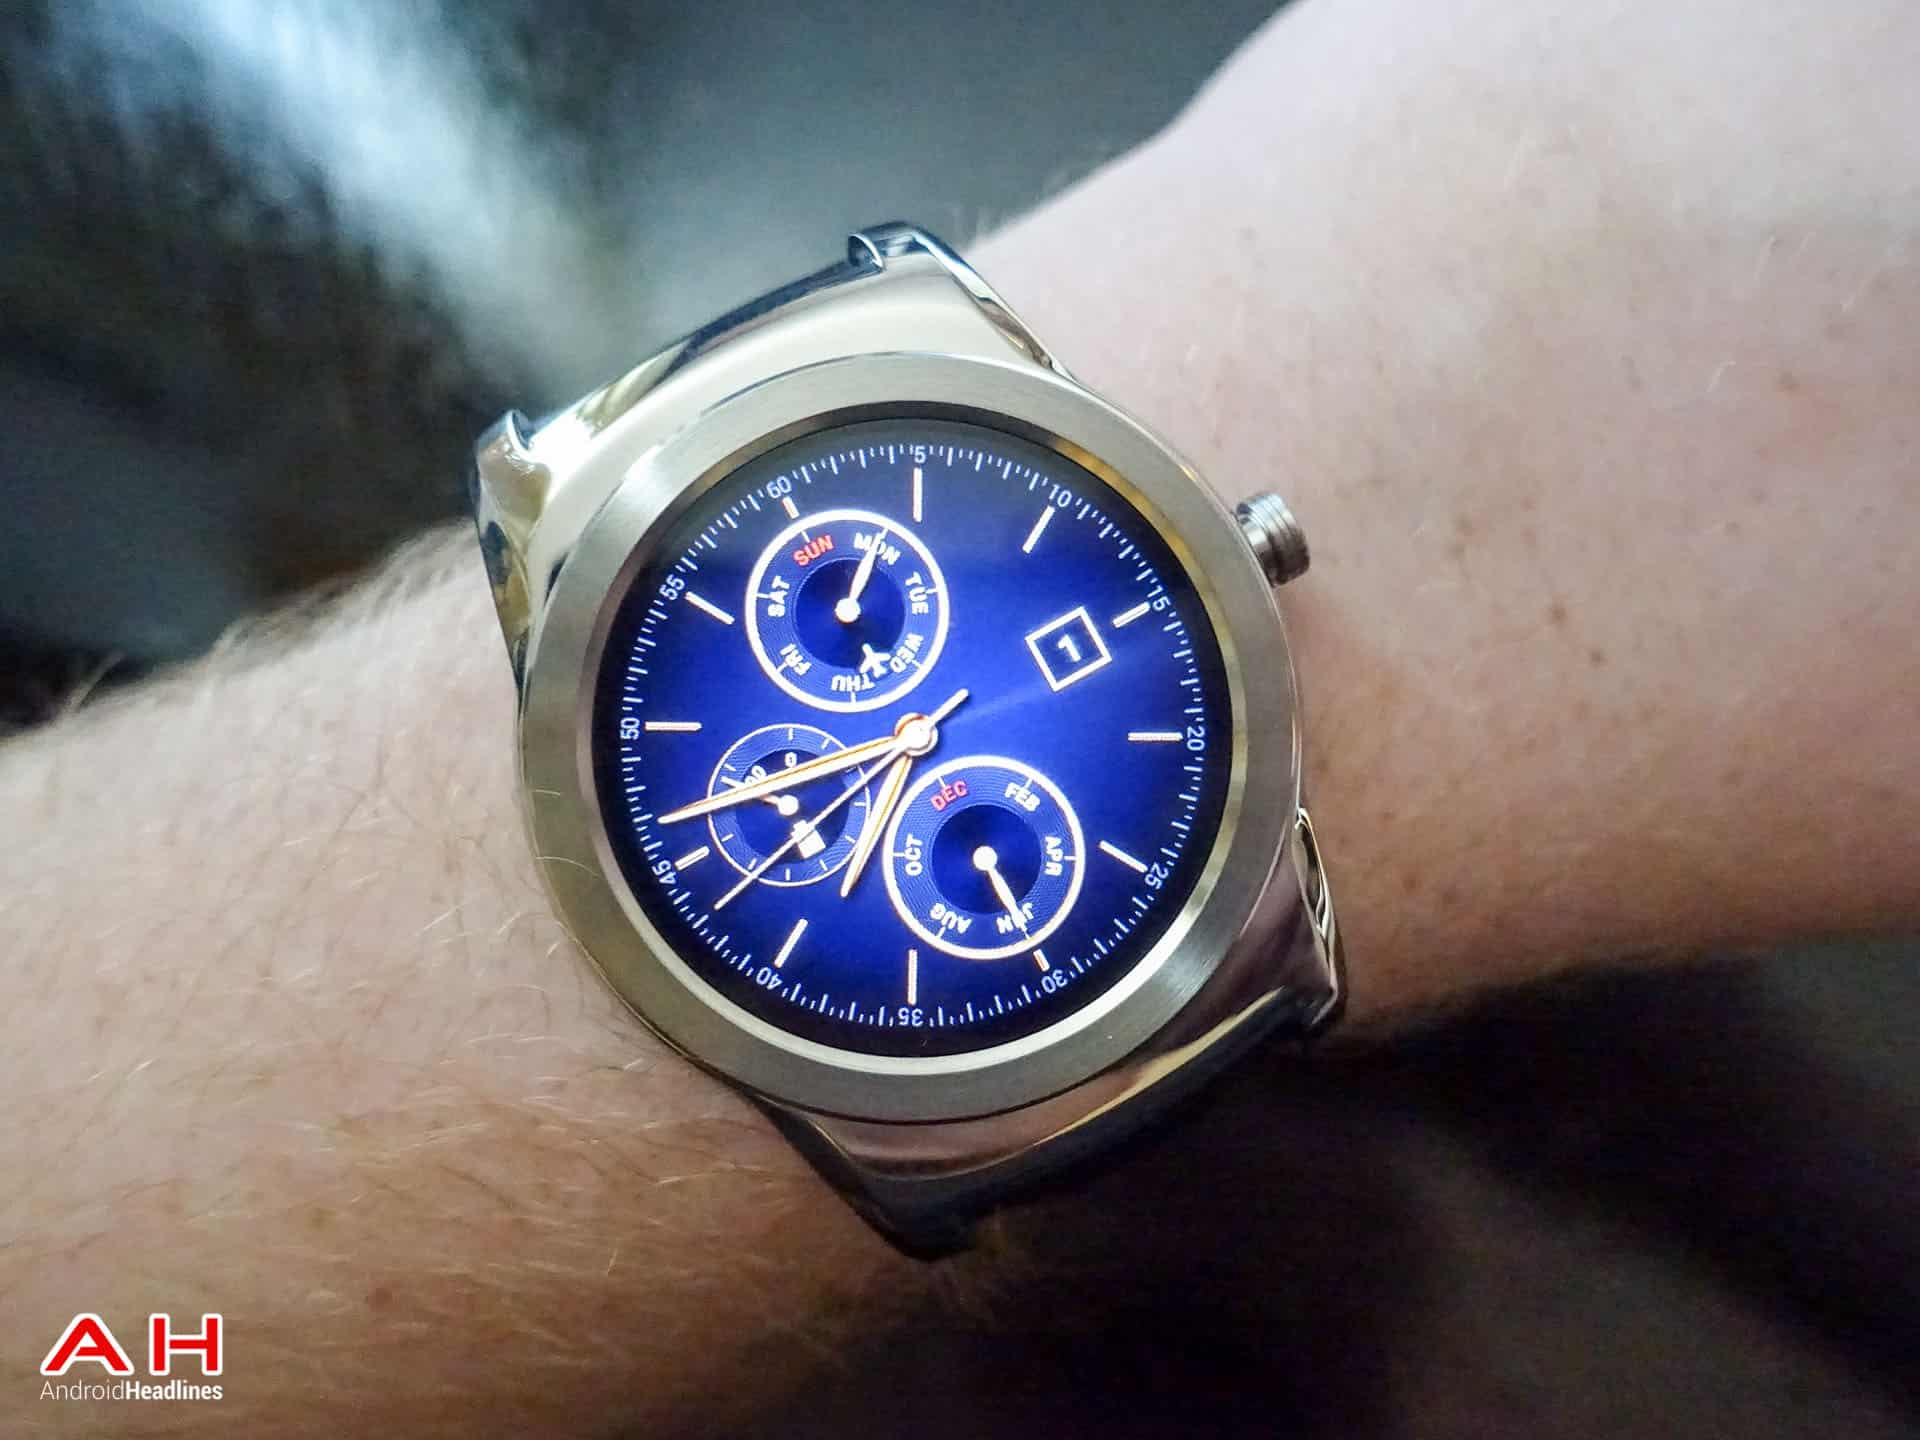 LG-Watch-Urbane-Review-AH-12